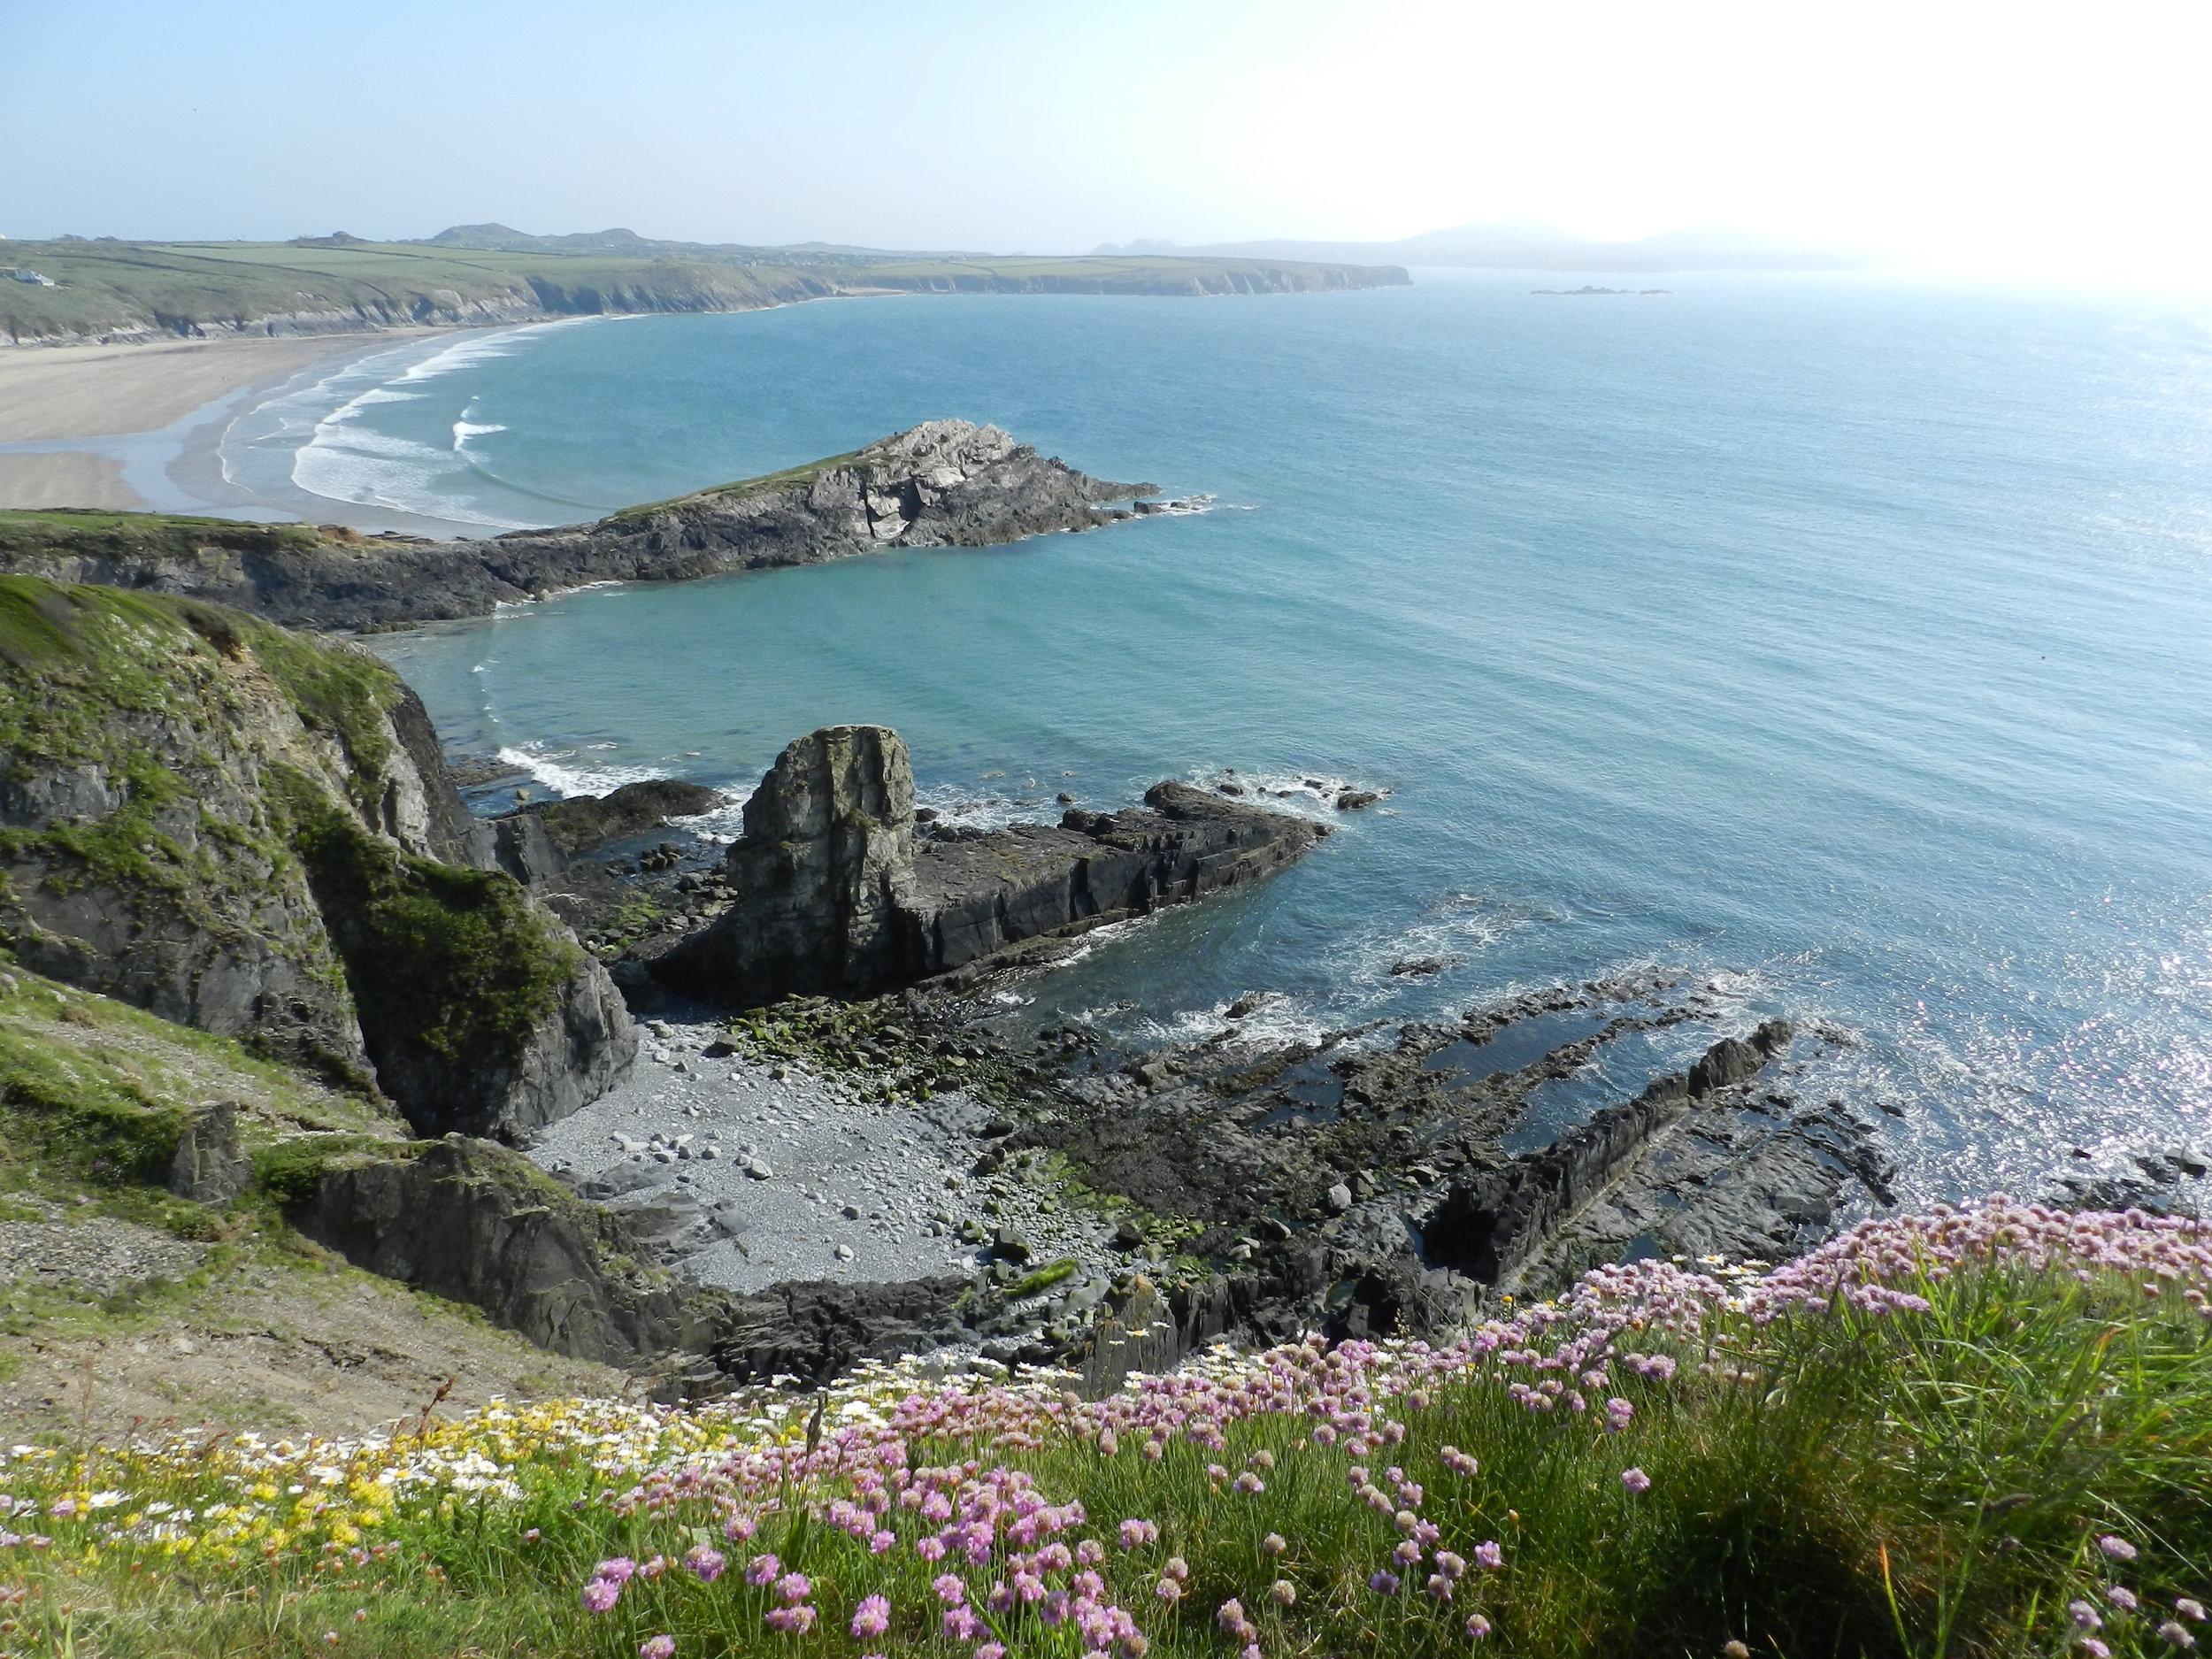 Whitesands from St. David's Head (Penmaen Dewi), Pembrokeshire, Wales